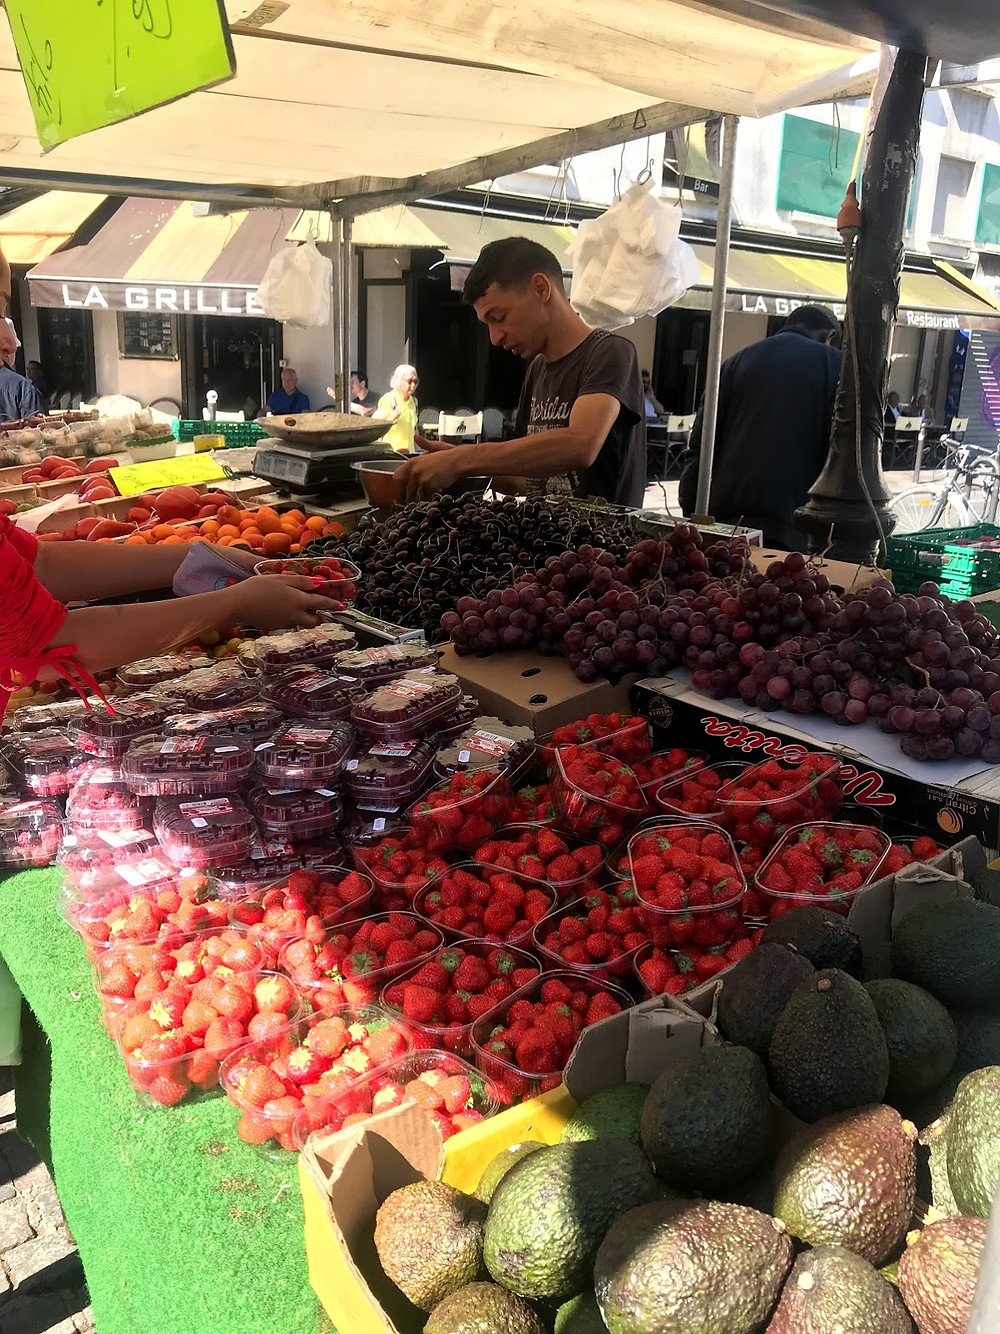 Morning market in Paris.